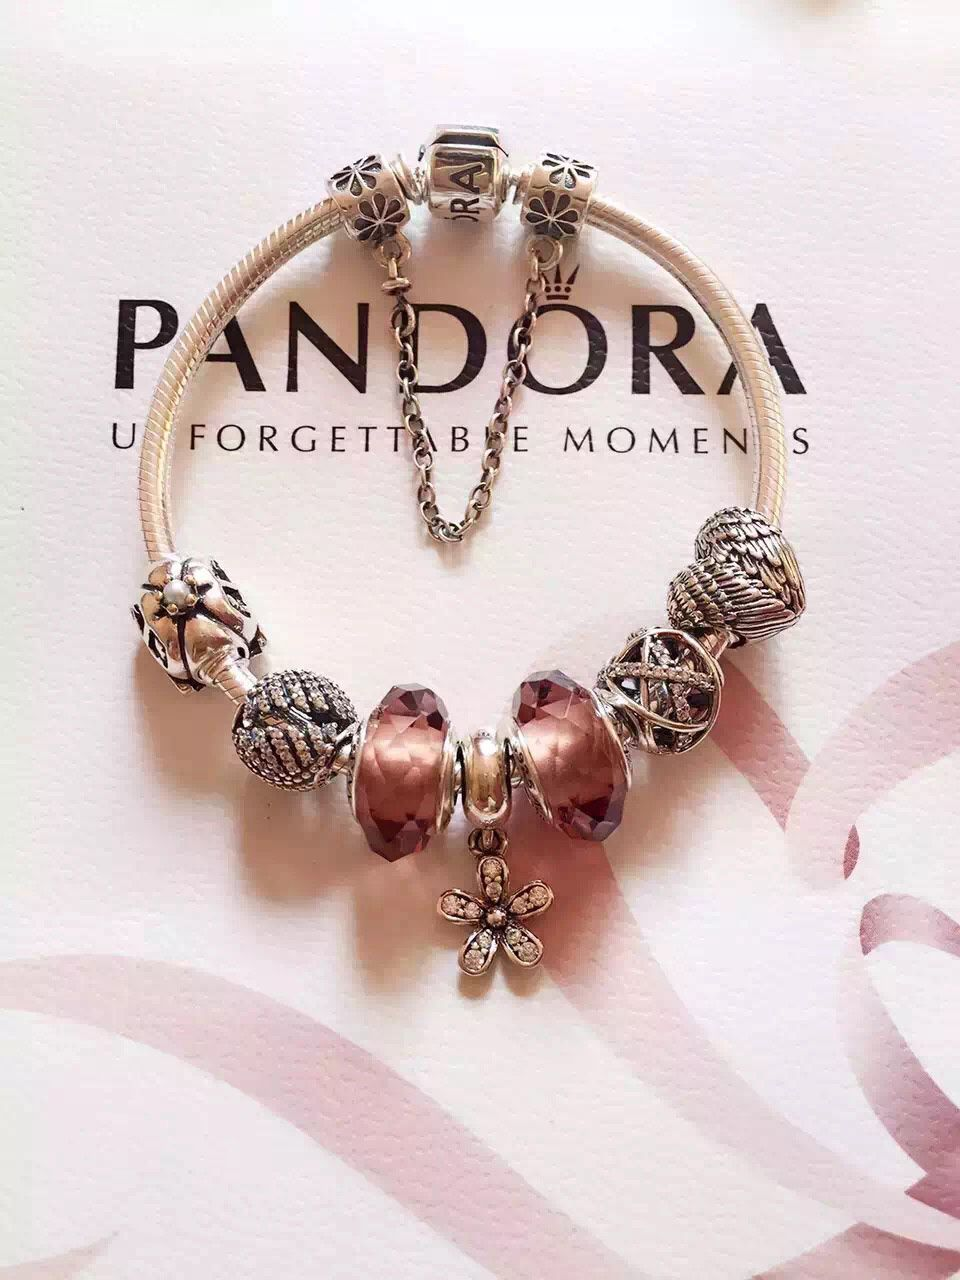 Pandora Bracelet Design Ideas 25 best ideas about pandora charm bracelets on pinterest pandora bracelets pandora pandora and charms for pandora bracelet 219 Pandora Charm Bracelet Pink Hot Sale